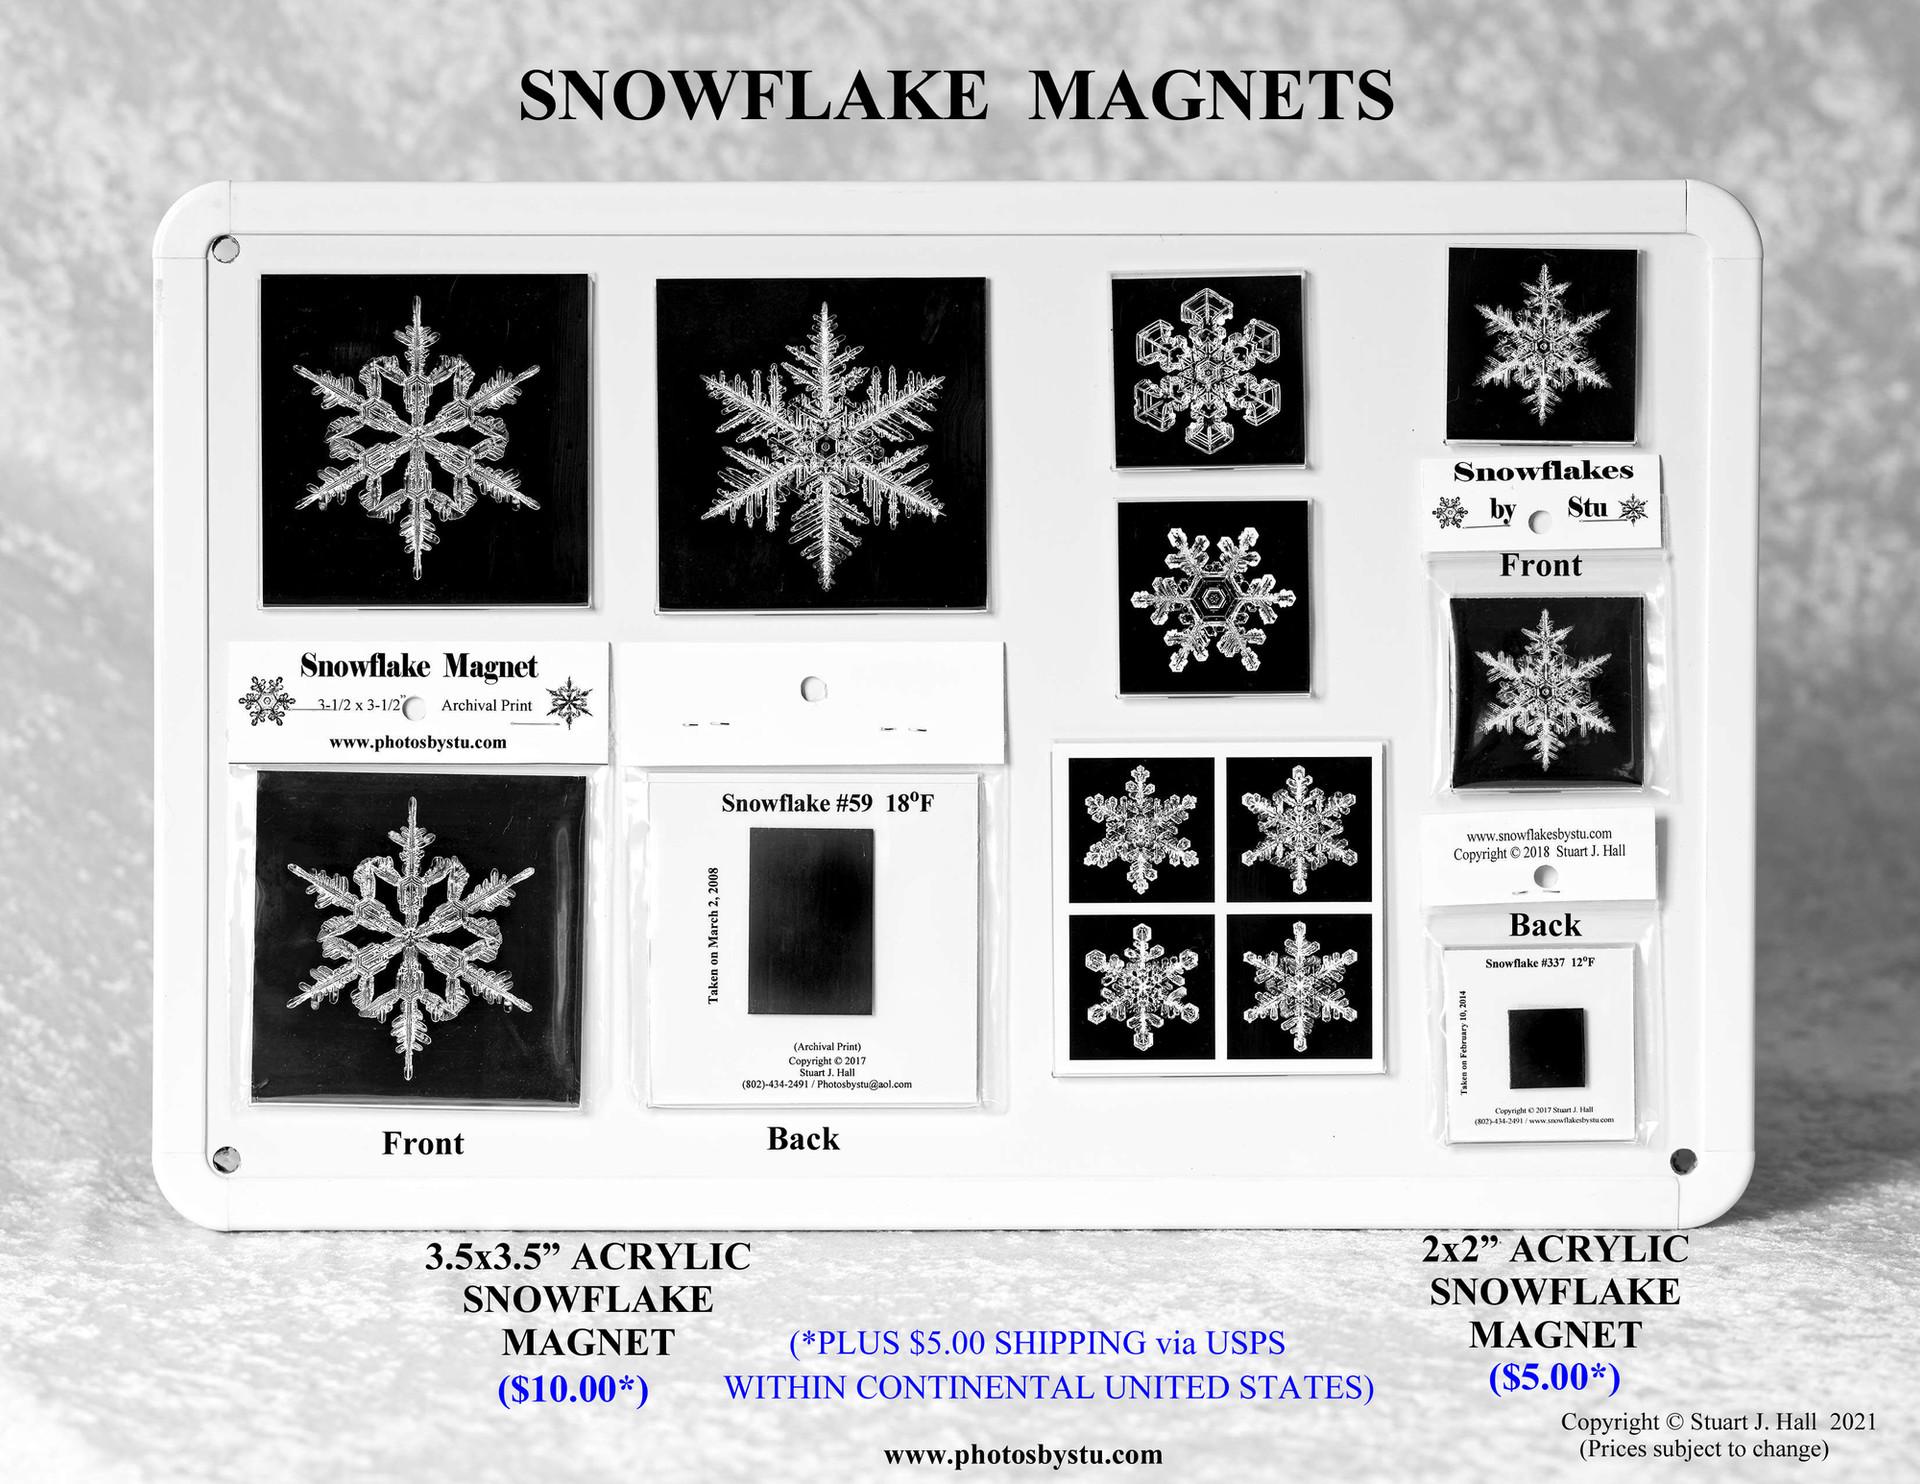 SF_Merchandise_Sheets_4.jpg